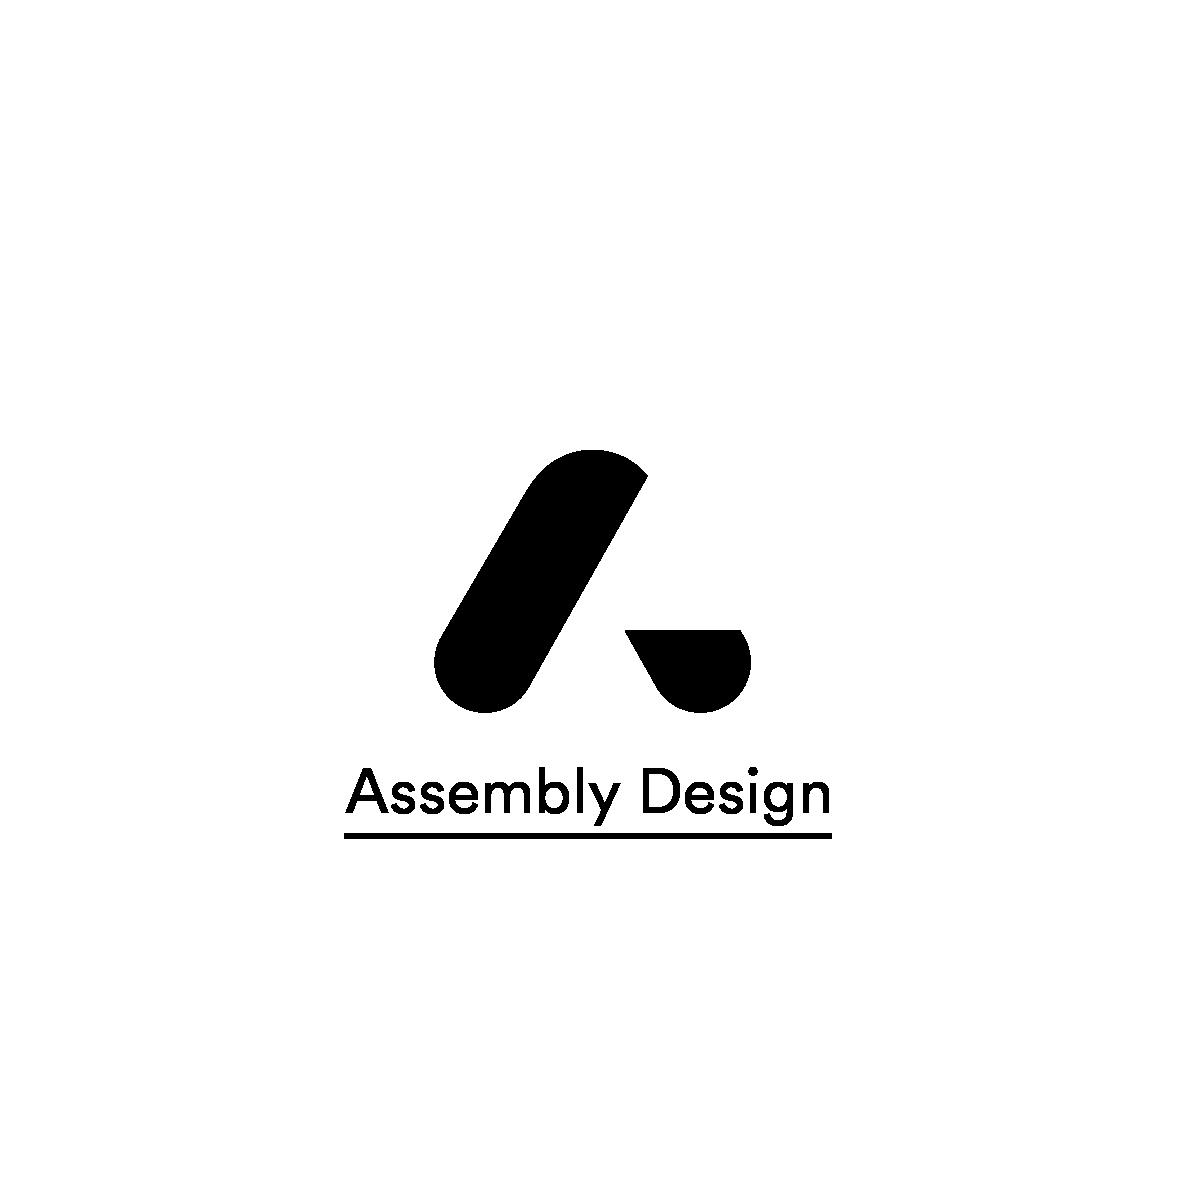 AssemblyDesign2-01.png